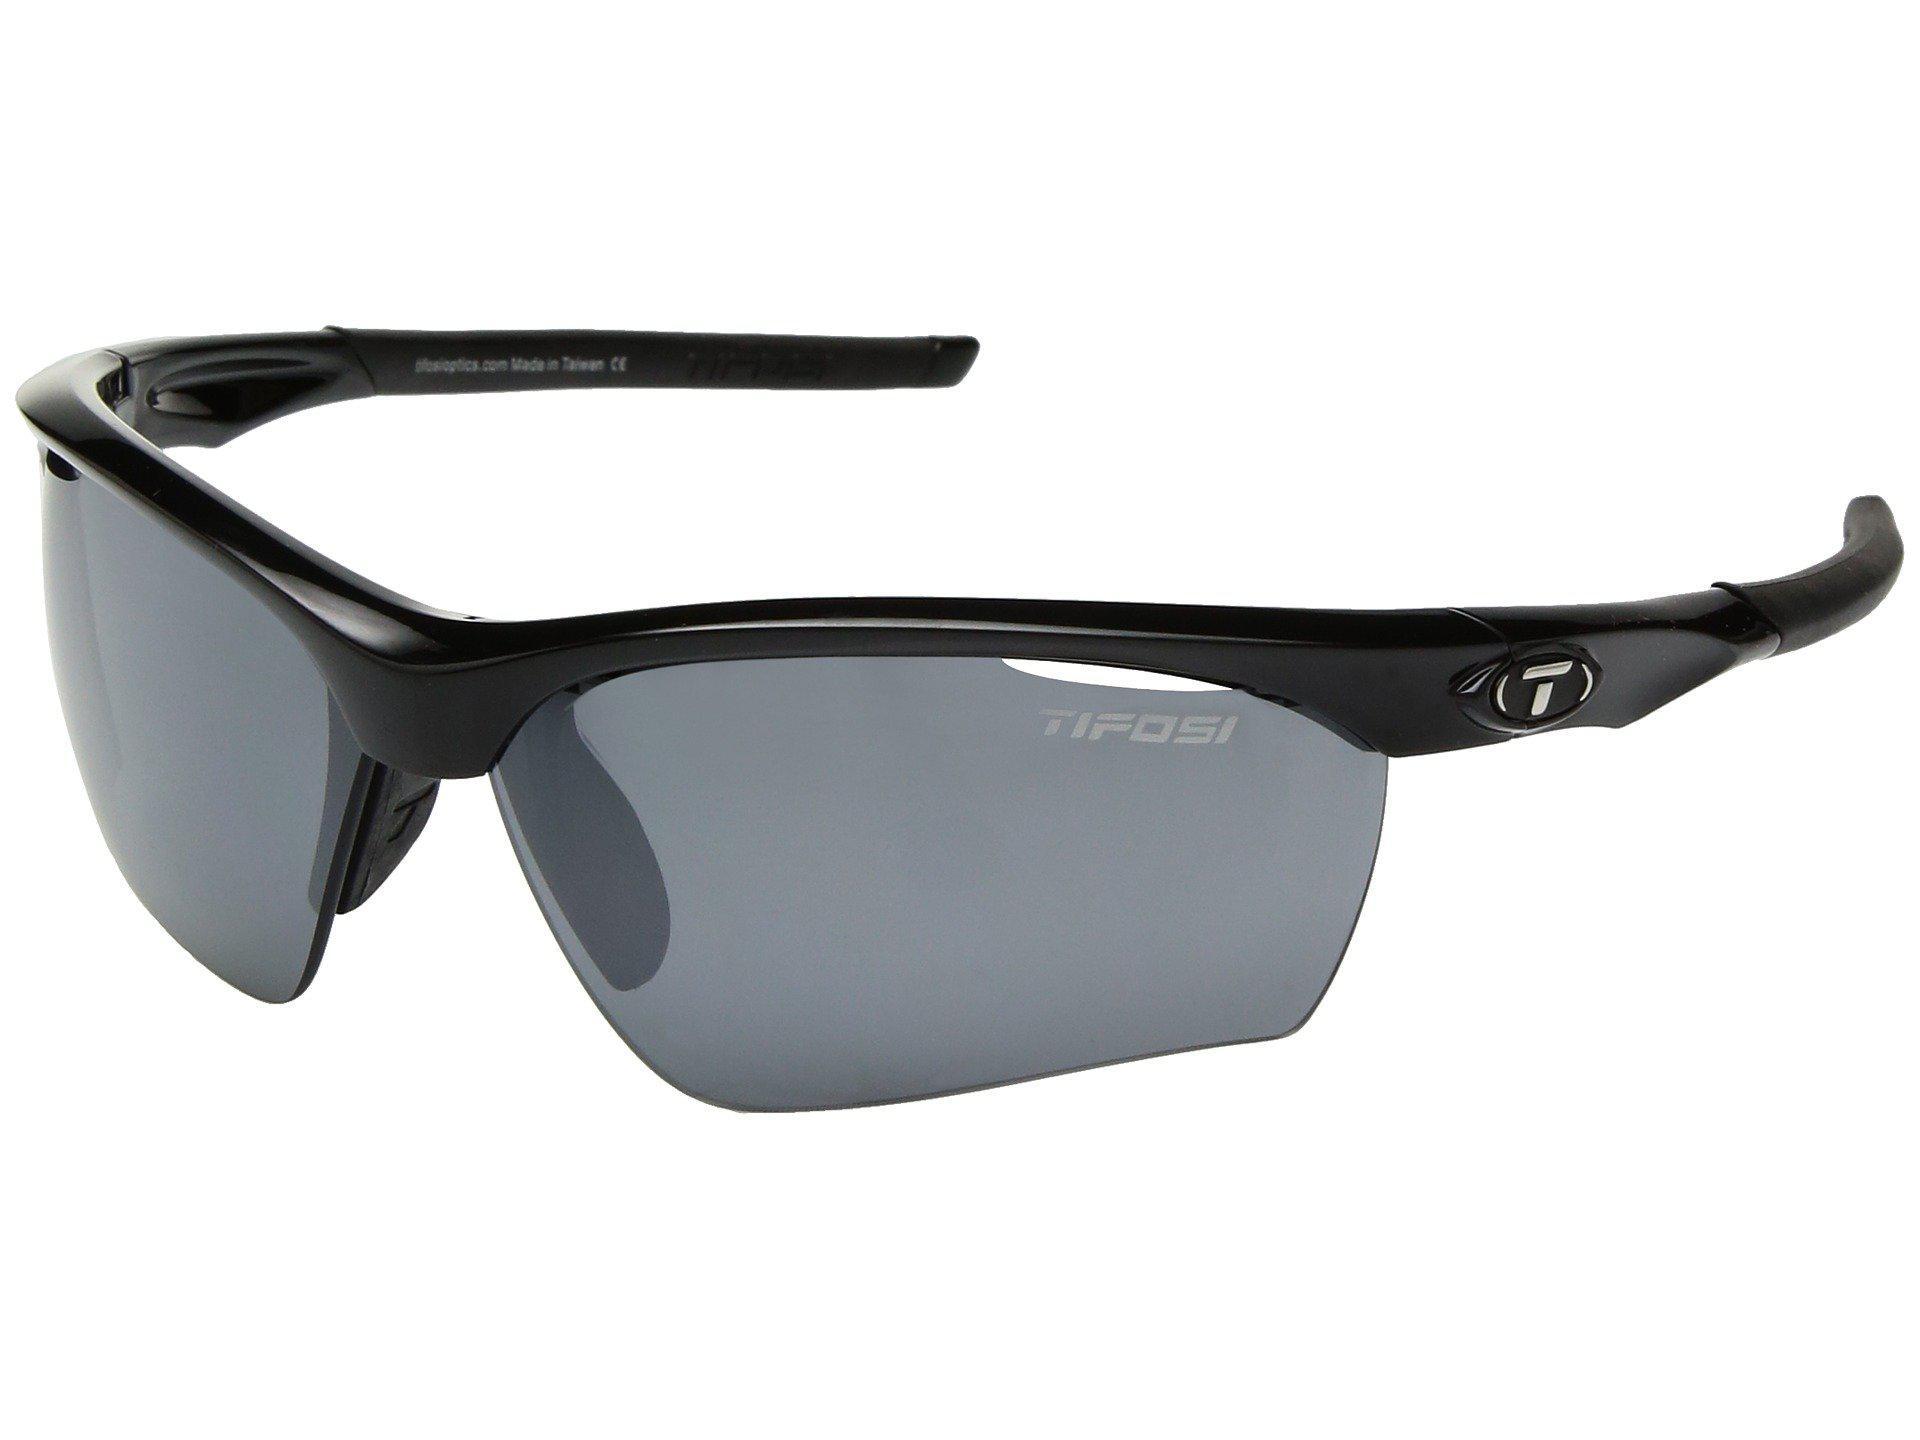 3ba6d46a9f Tifosi Optics. Men s Vero (gloss Black smoke gt ec Lens) Athletic  Performance Sport Sunglasses